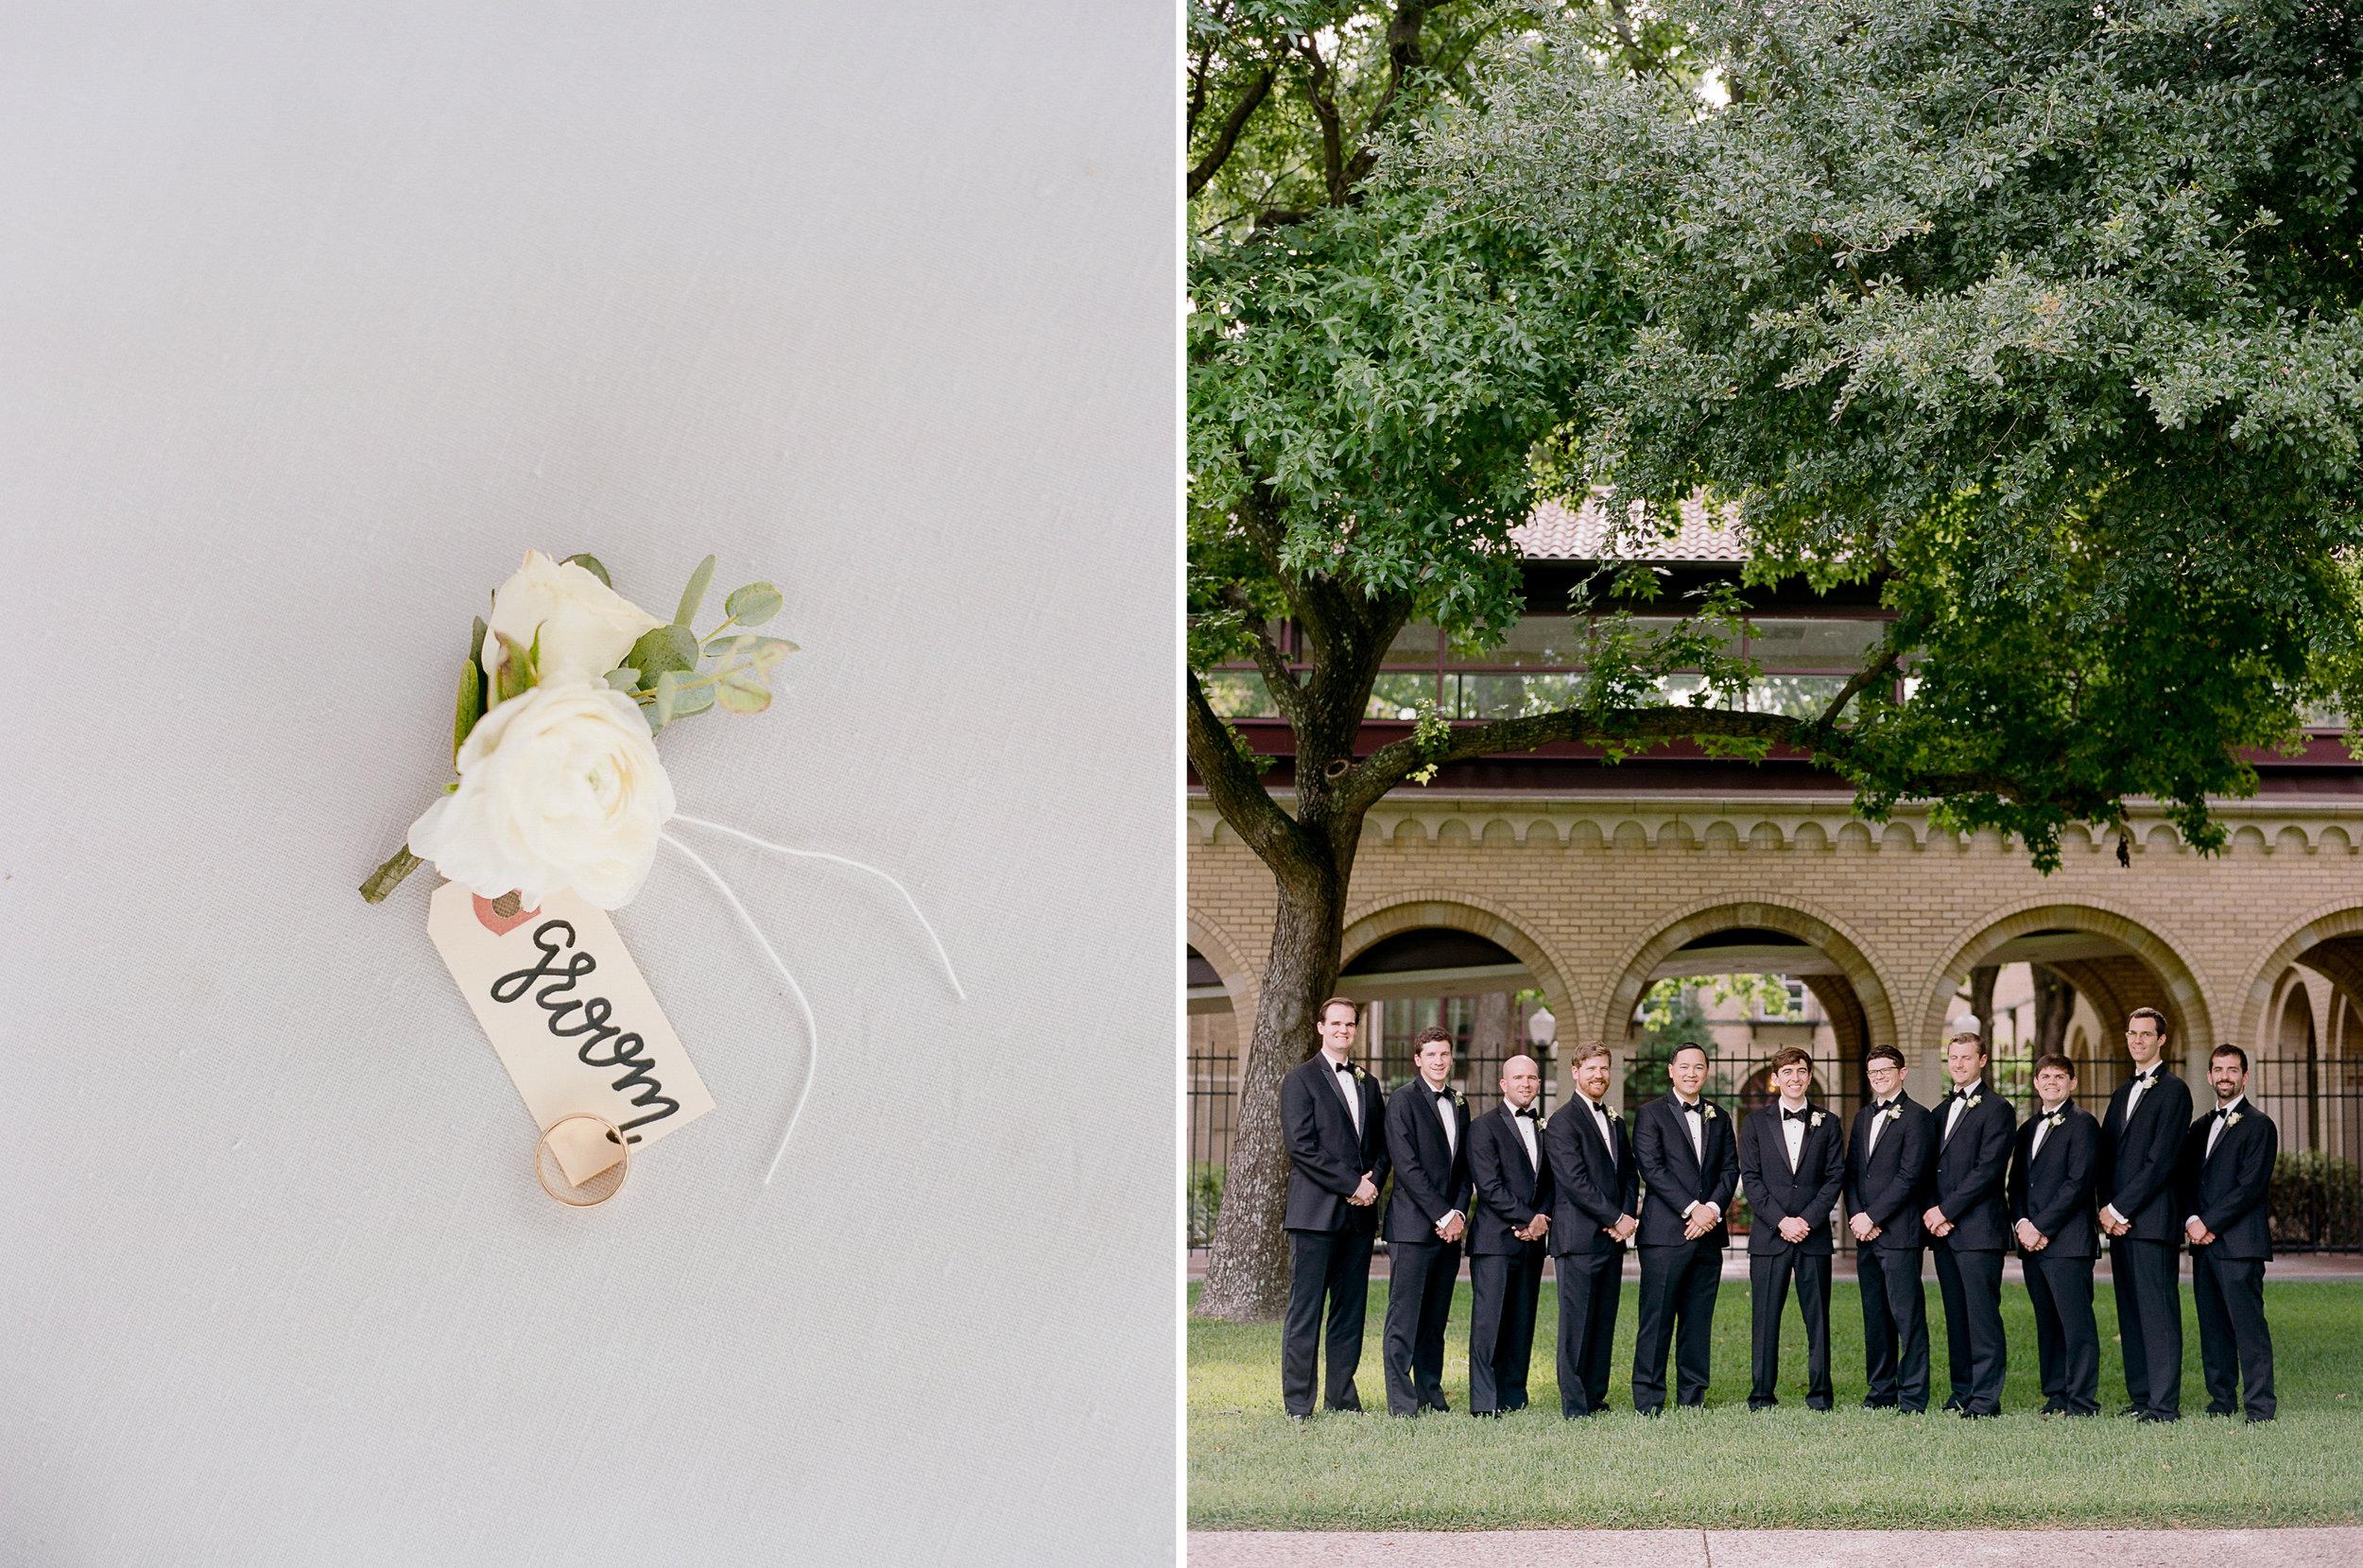 Fine-Art-Film-Houston-Wedding-Photographer-Best-Top-Luxury-Texas-Austin-Dallas-Destination-Dana-Fernandez-Photography-River-Oaks-Country-Club-South-Main-Baptist-Ceremony-Reception-Wedding-123.jpg